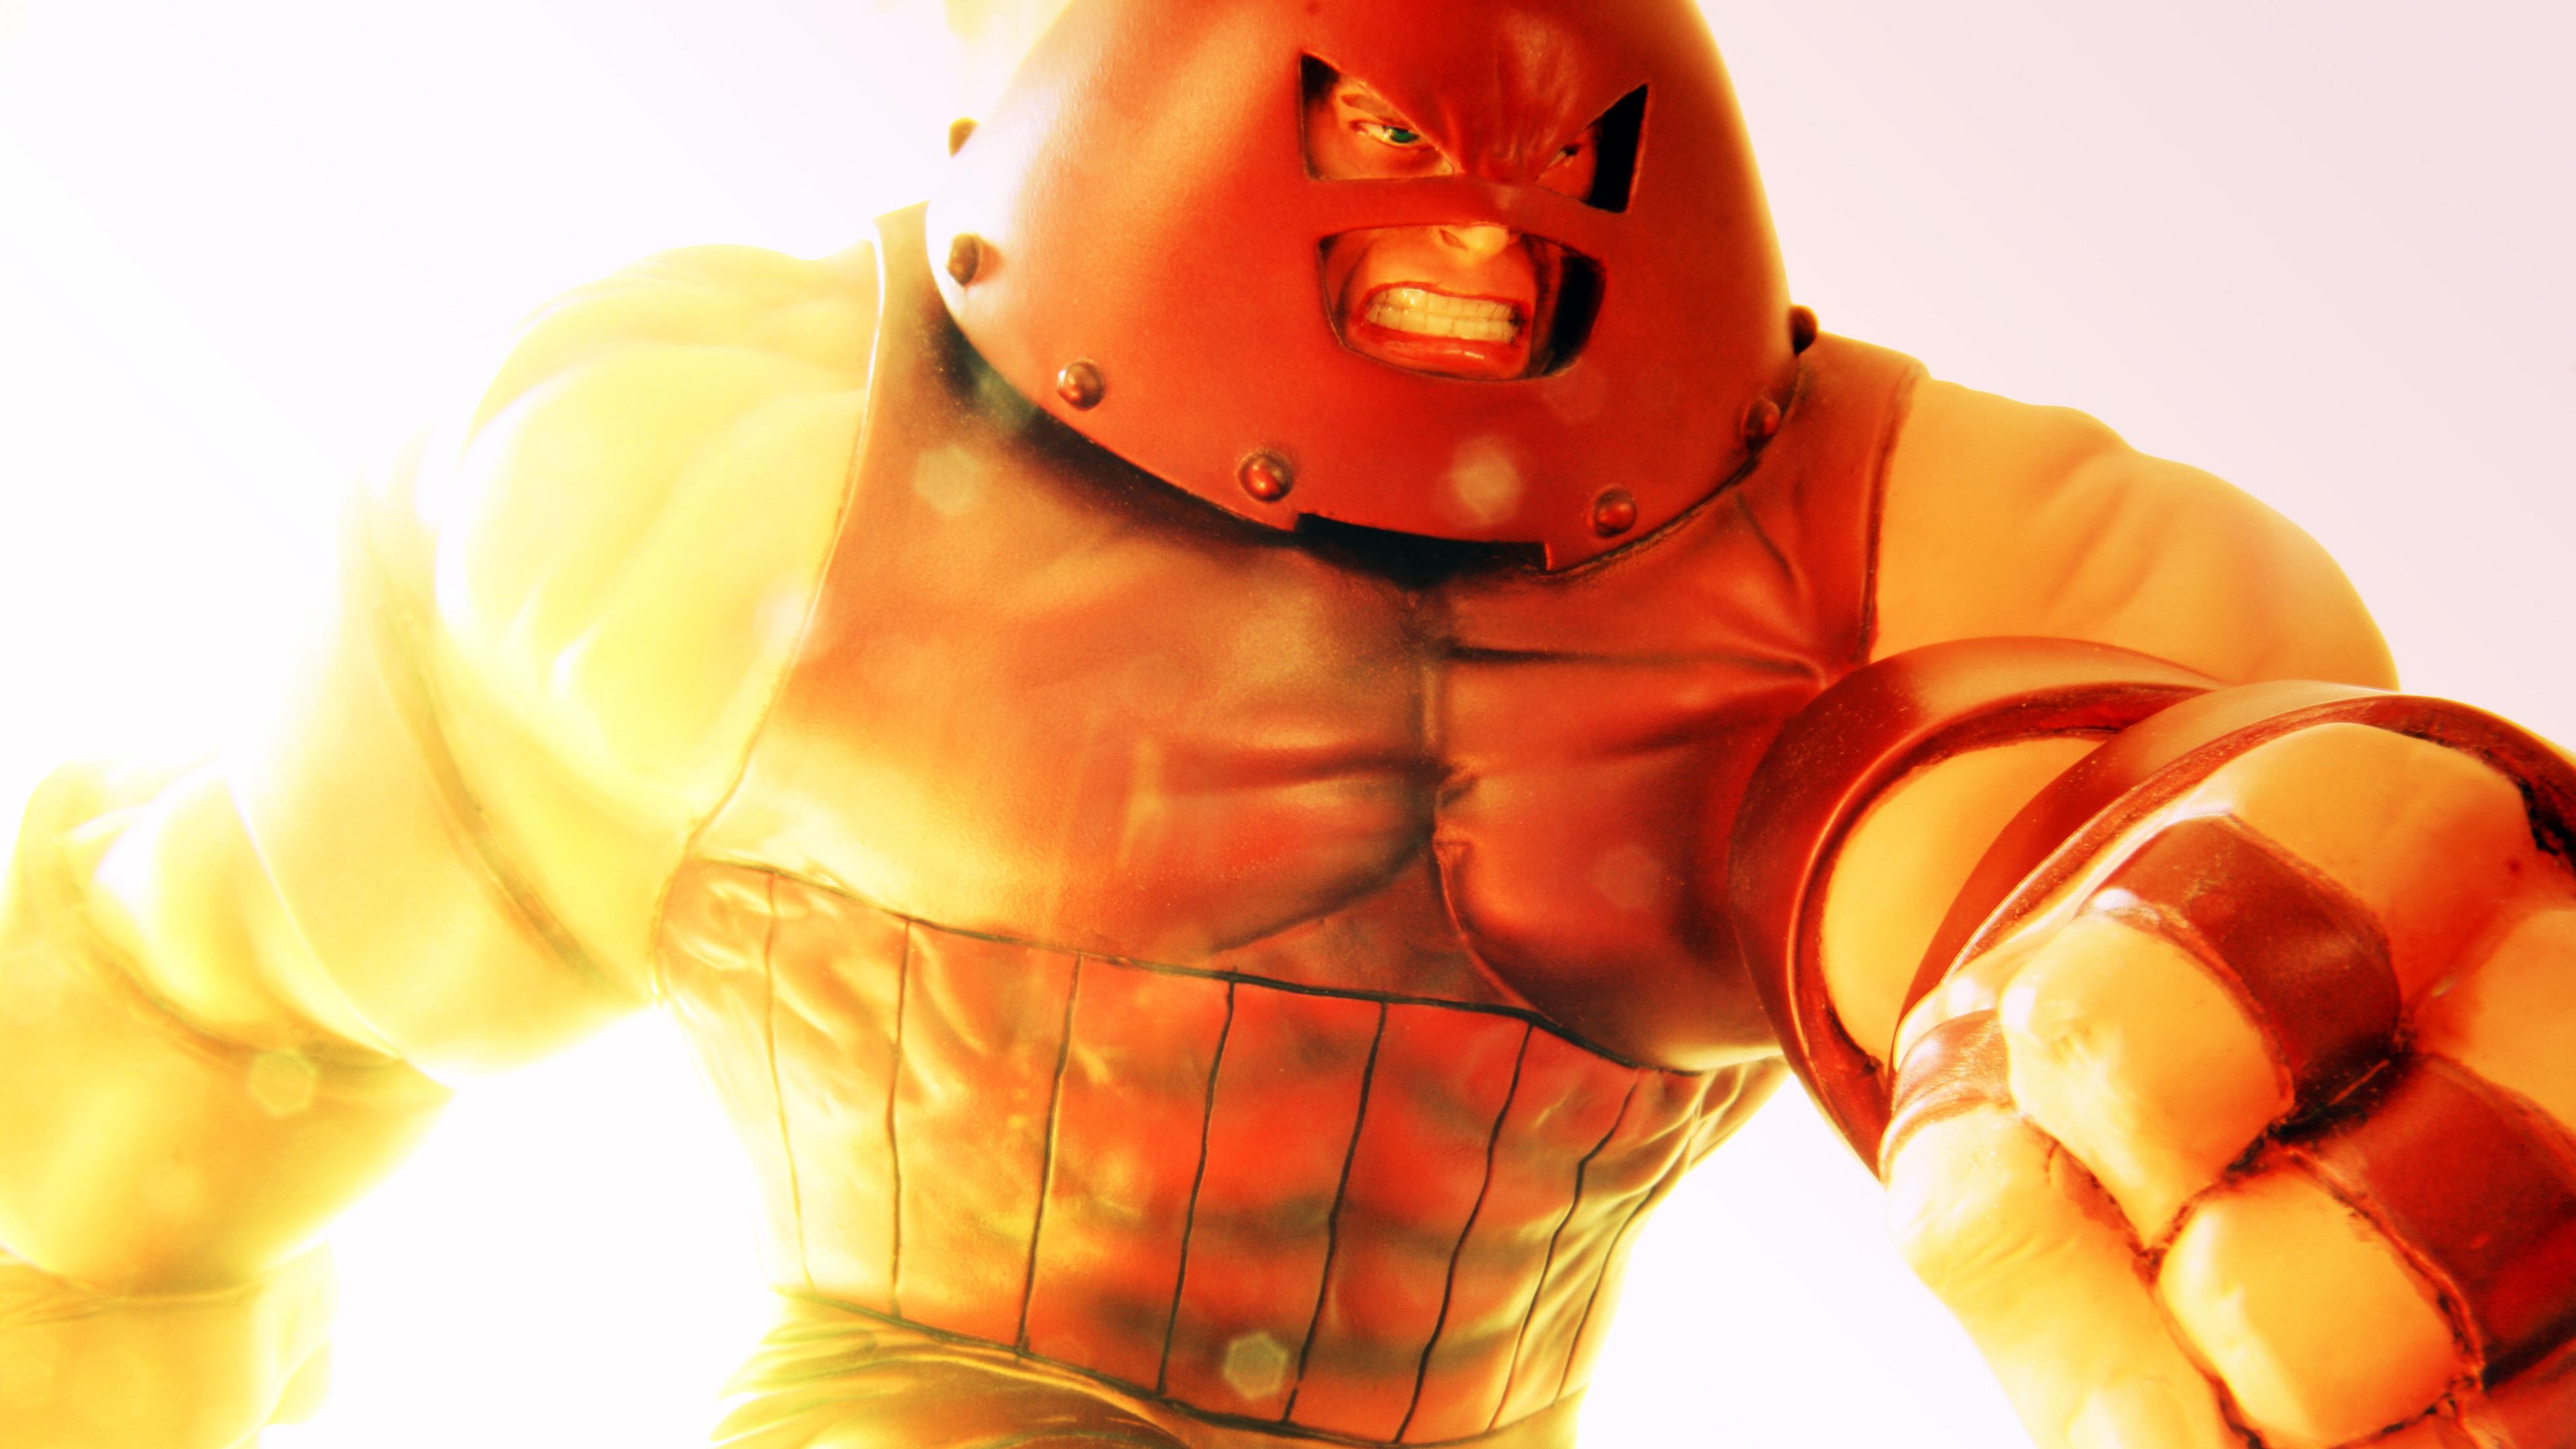 Juggernaut 4k Ultra Hd Wallpaper Background Image 3900x2194 Id